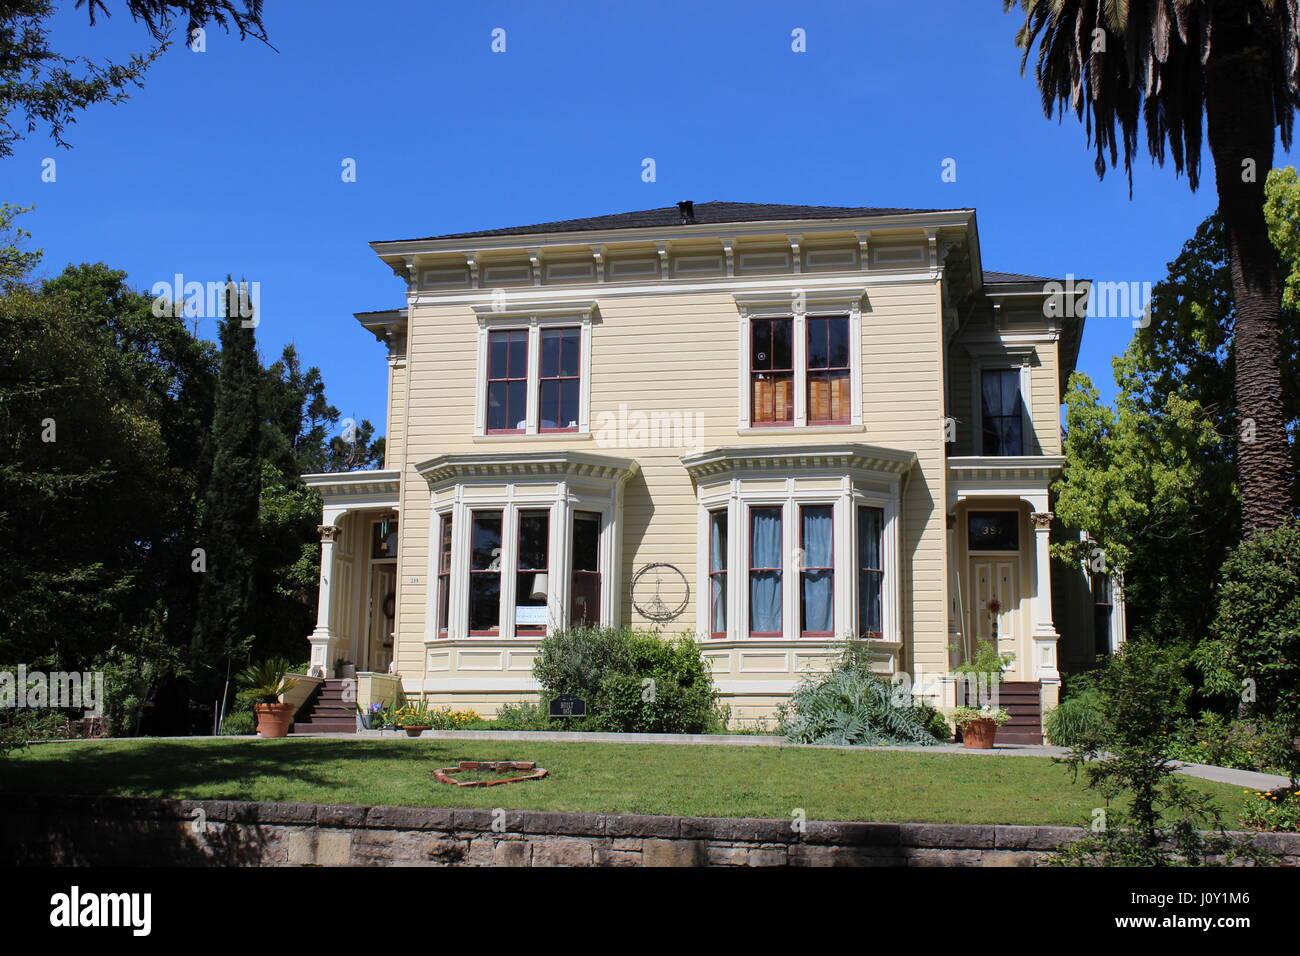 Italianate Victorian double house in Napa, California built in 1874. - Stock Image